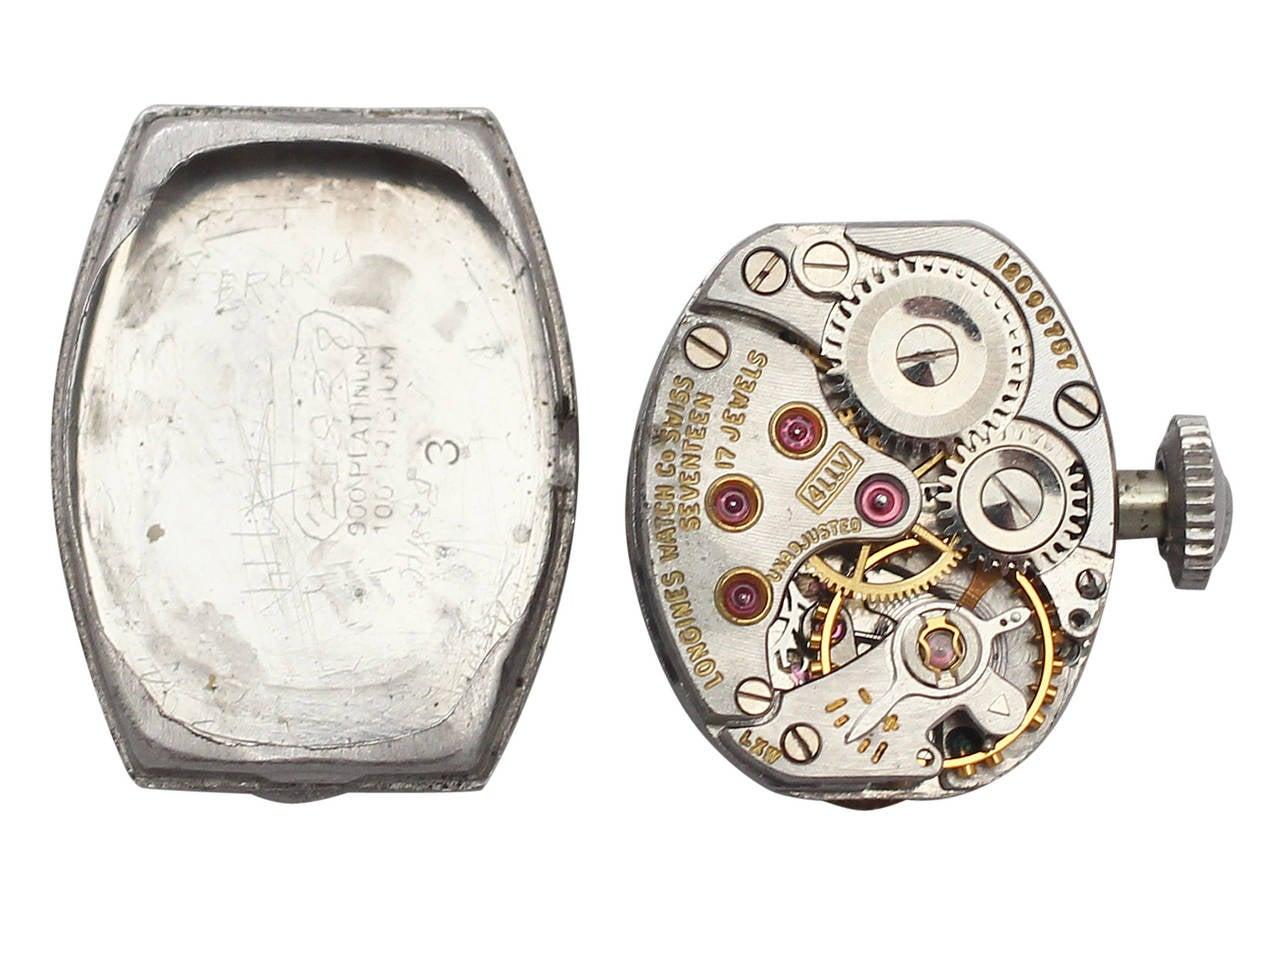 1950s 2.26 carat Diamond Platinum and White Gold Longines Cocktail Watch 6